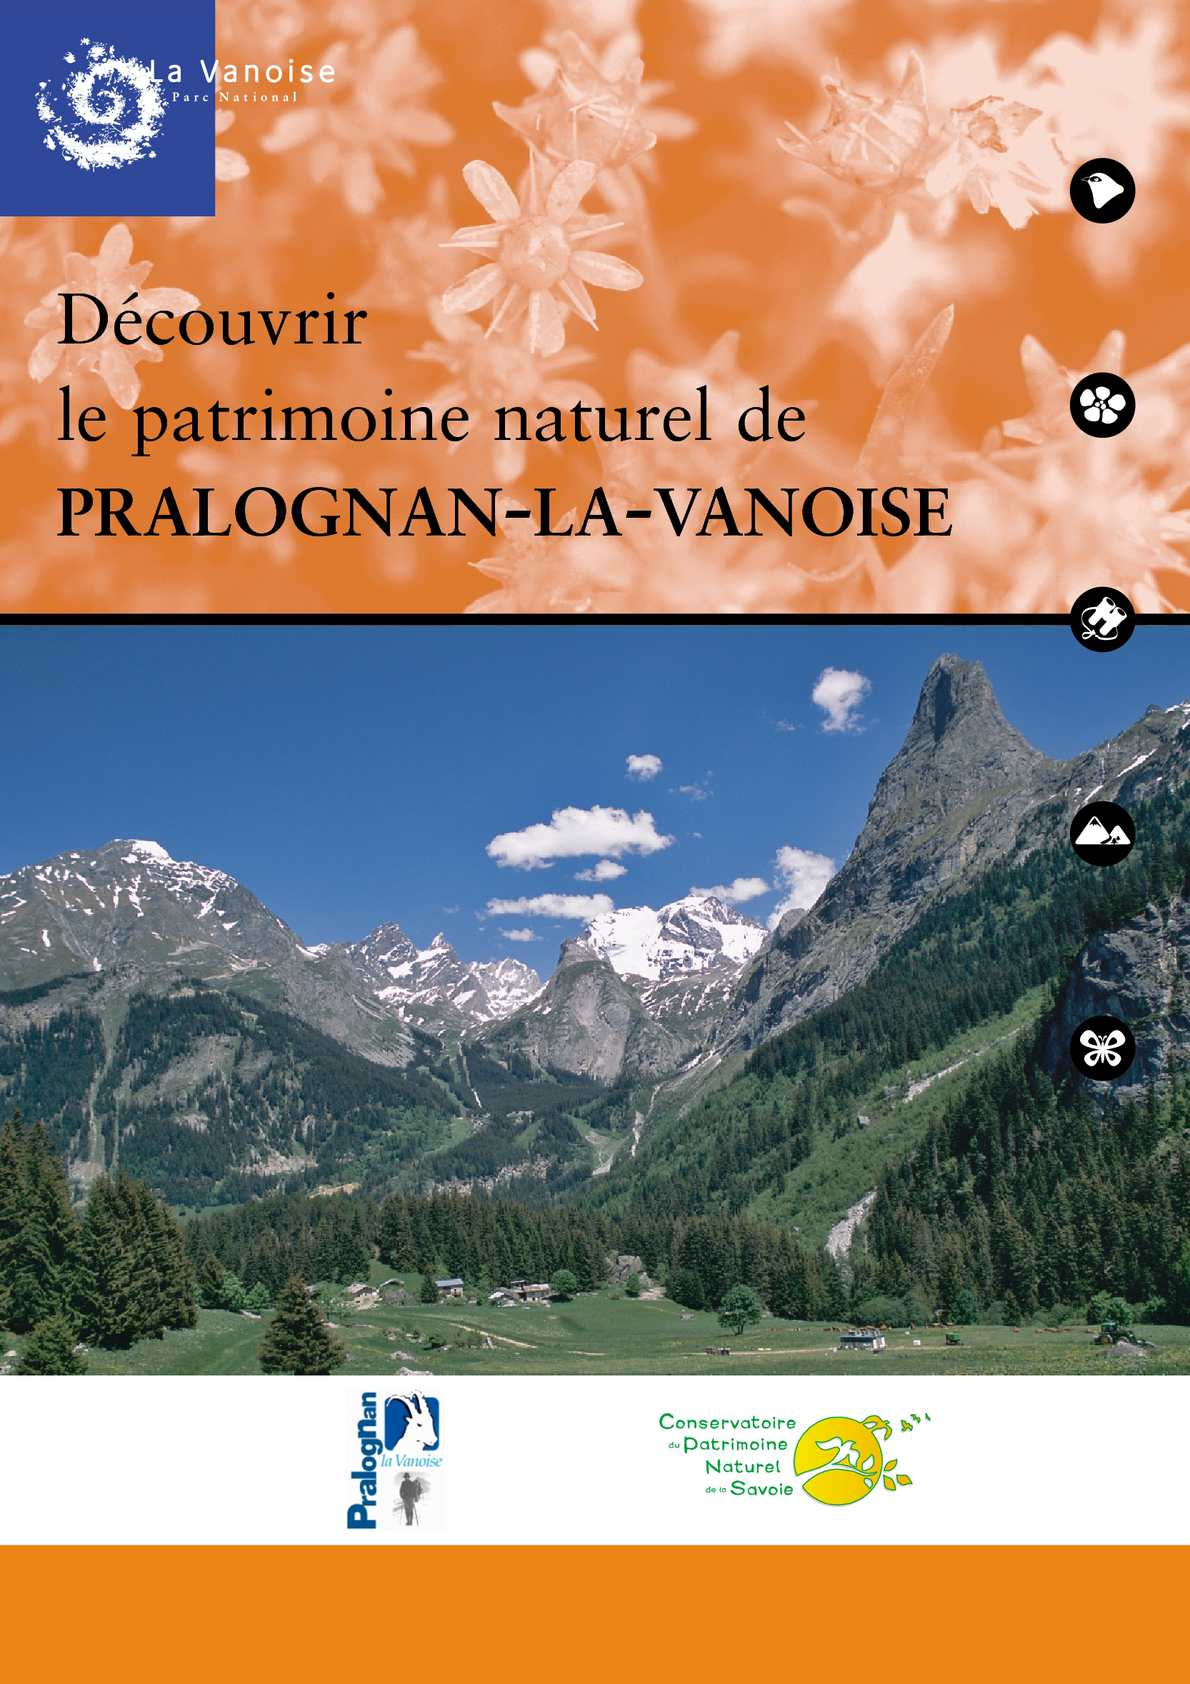 Calam o patrimoine naturel de pralognan la vanoise - Pralognan la vanoise office du tourisme ...